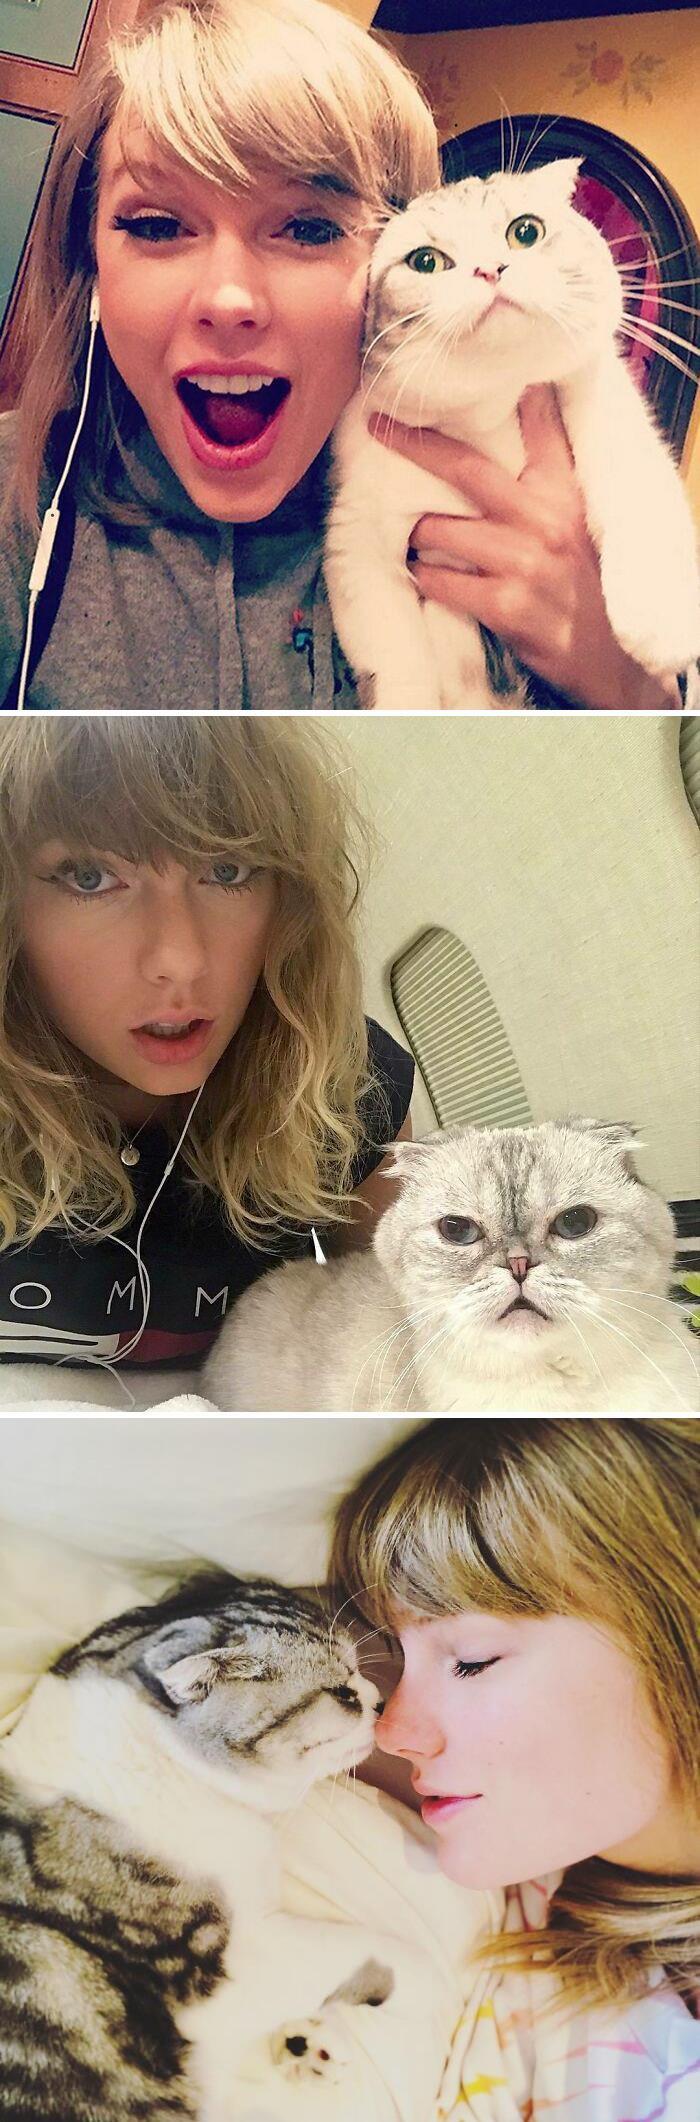 18. Taylor Swift is a bonafide cat lady.